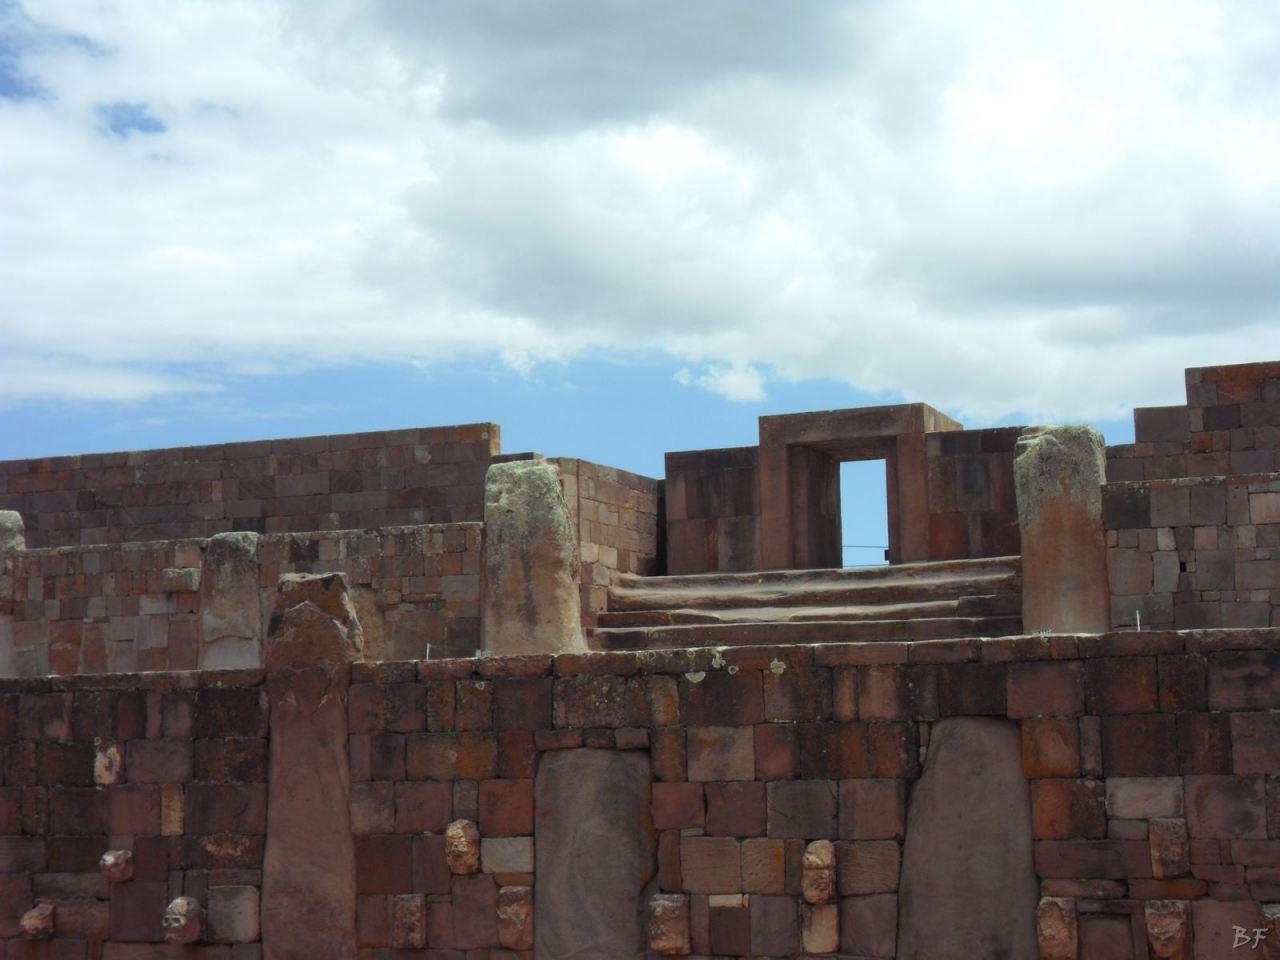 Sito-Megalitico-Piramide-Akapana-Kalasasaya-Menhir-Tiahuanaco-Bolivia-95